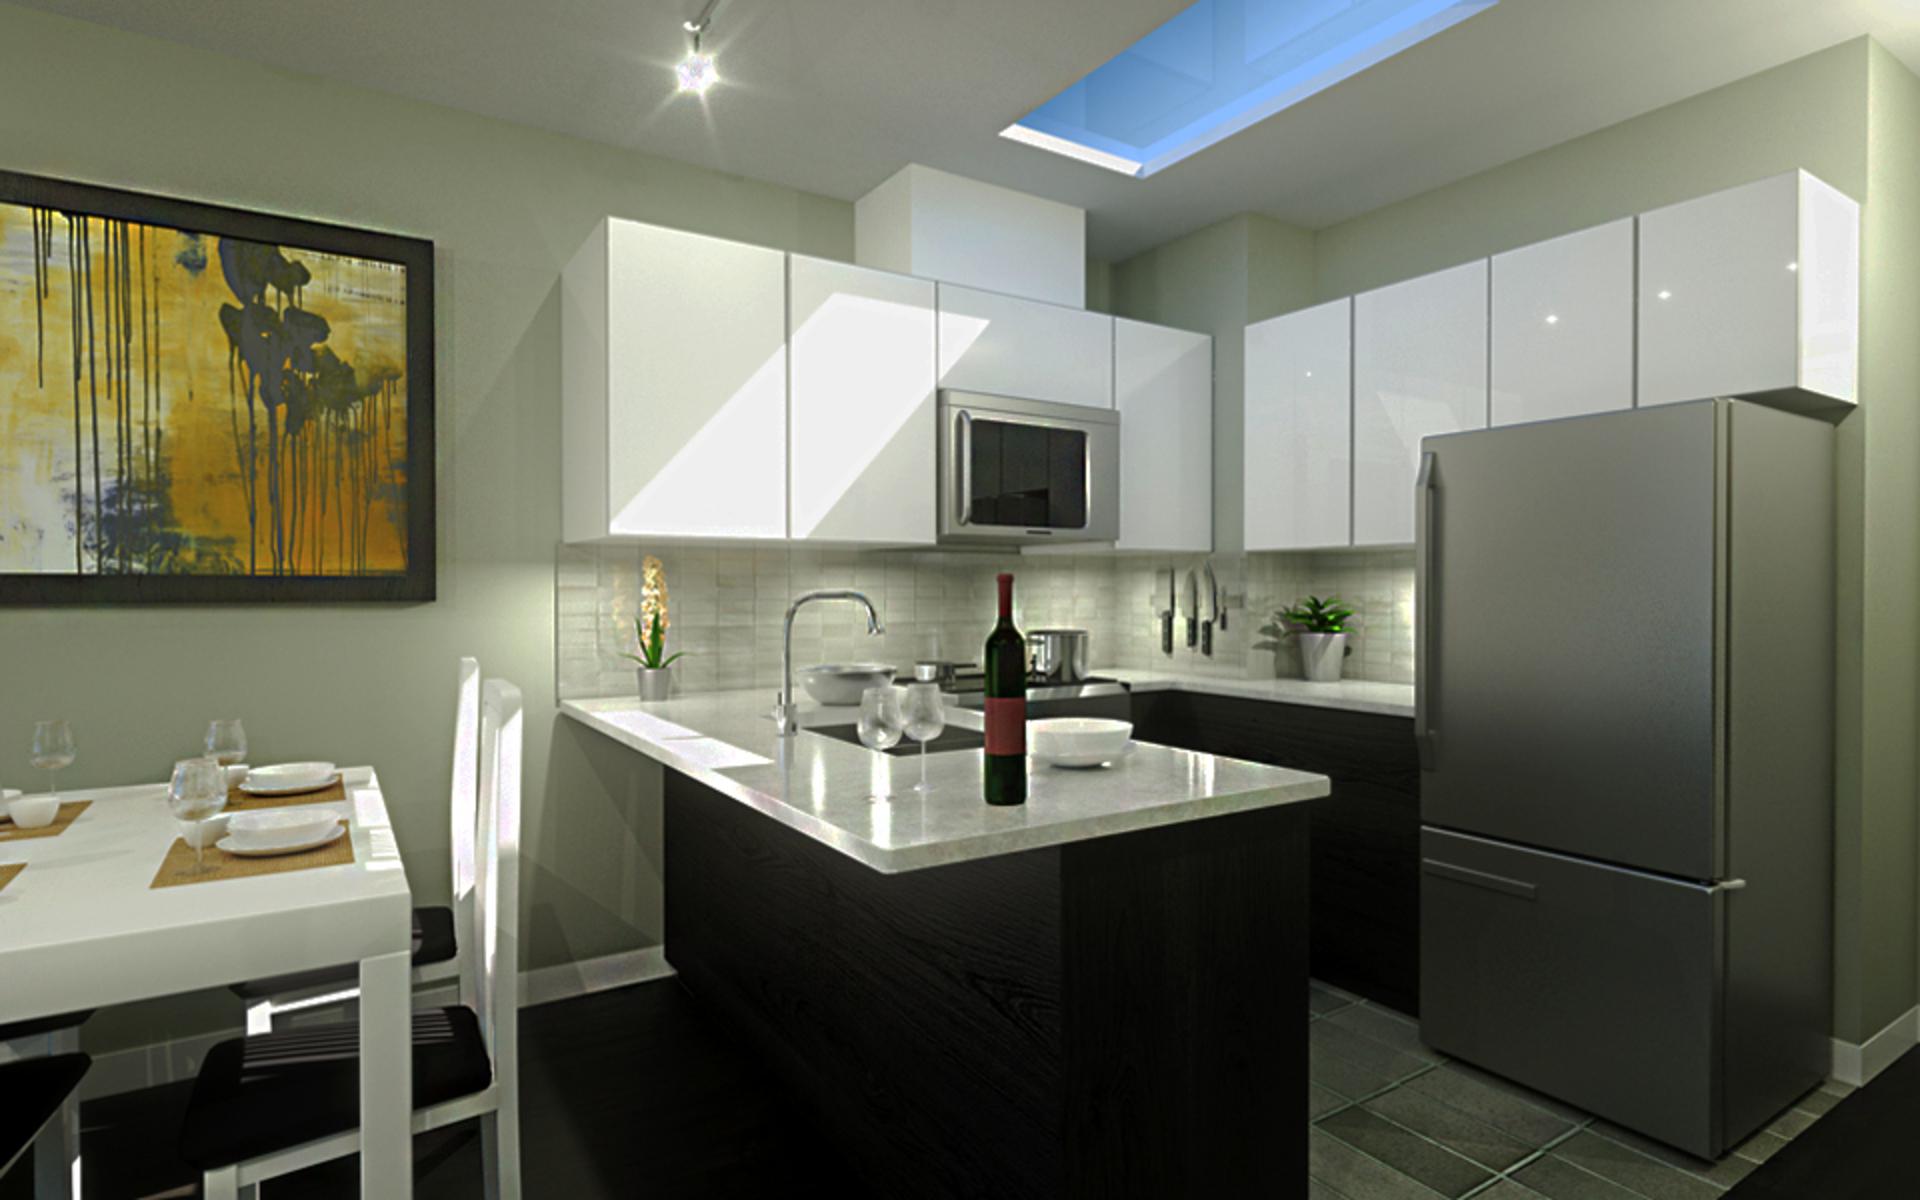 kensington-point-kitchens at Kensington Point (3939 Knight Street, Knight, Vancouver East)